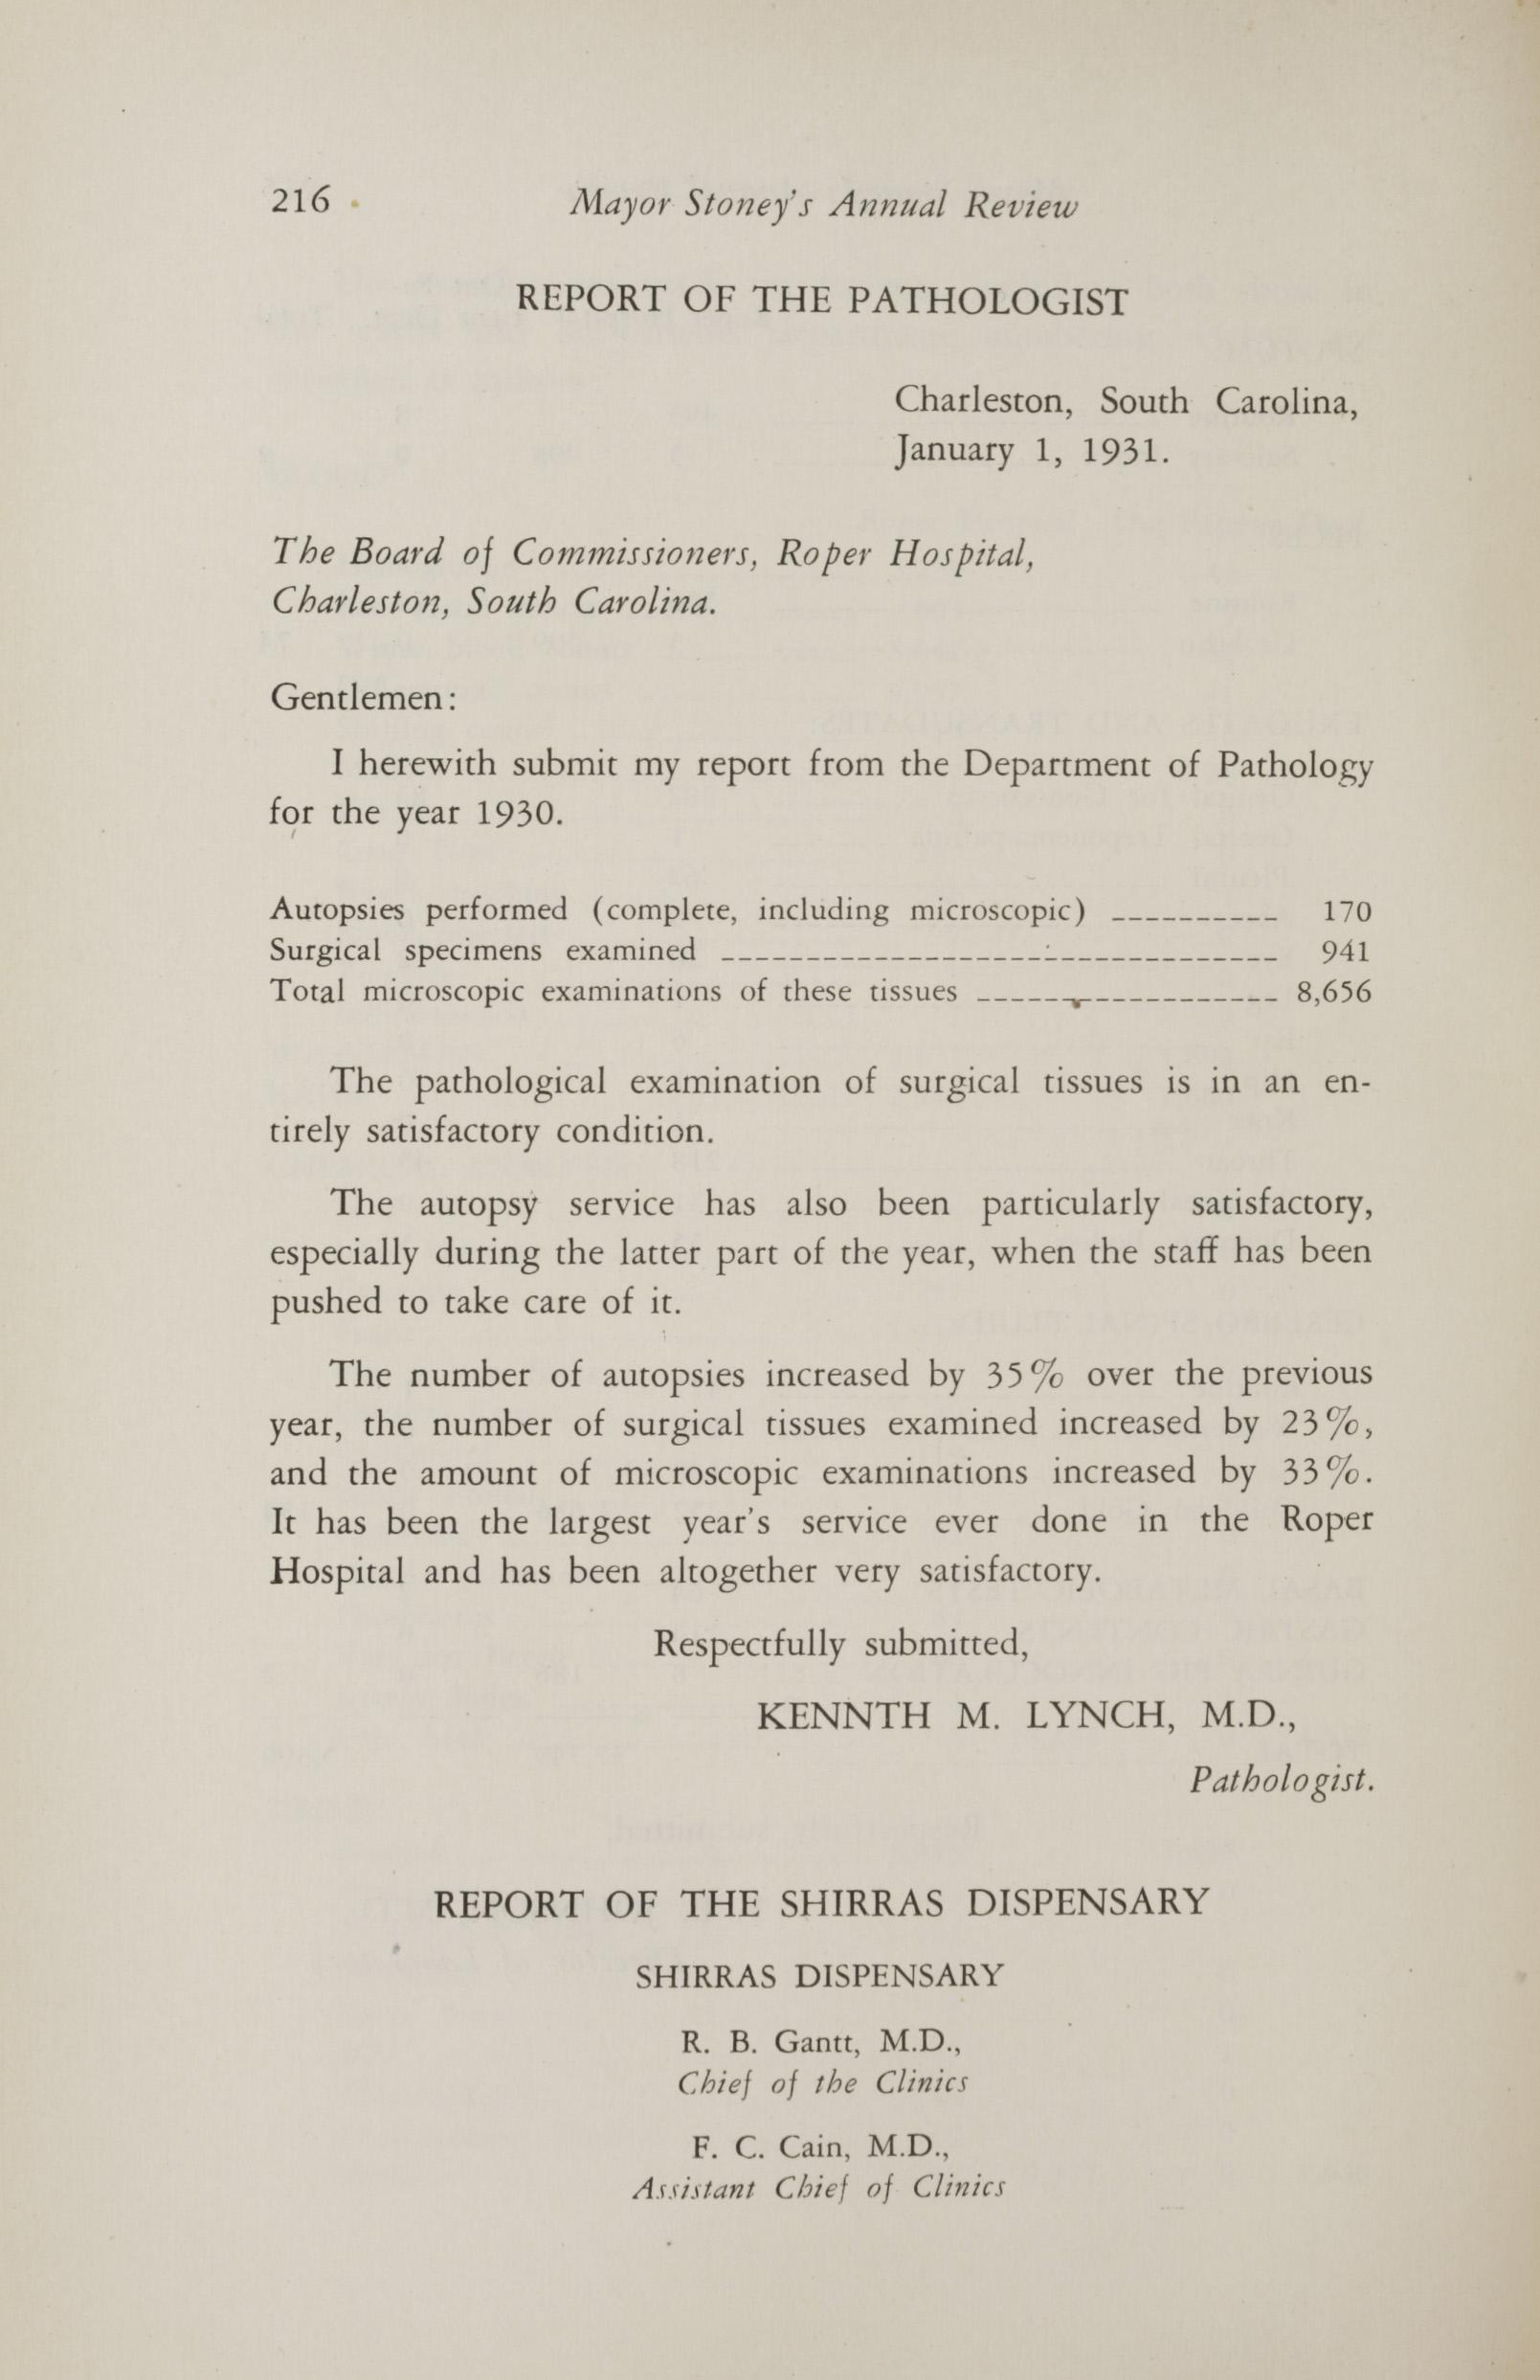 Charleston Yearbook, 1930, page 216